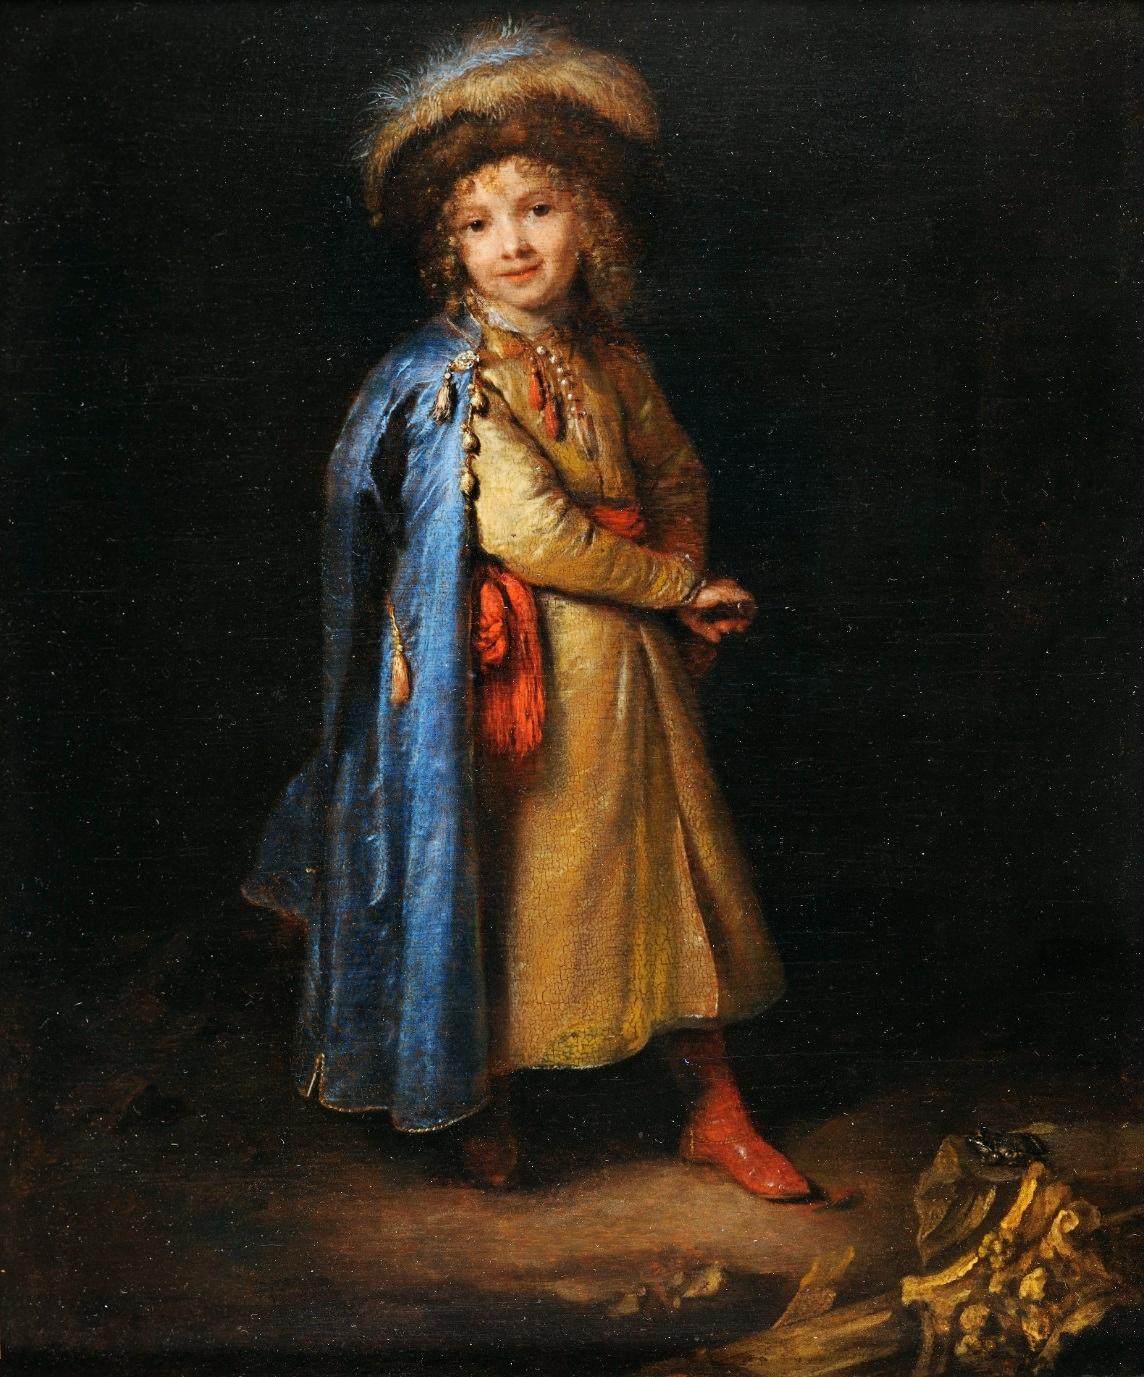 https://upload.wikimedia.org/wikipedia/commons/3/37/Netscher_Boy_in_Polish_costume.jpg